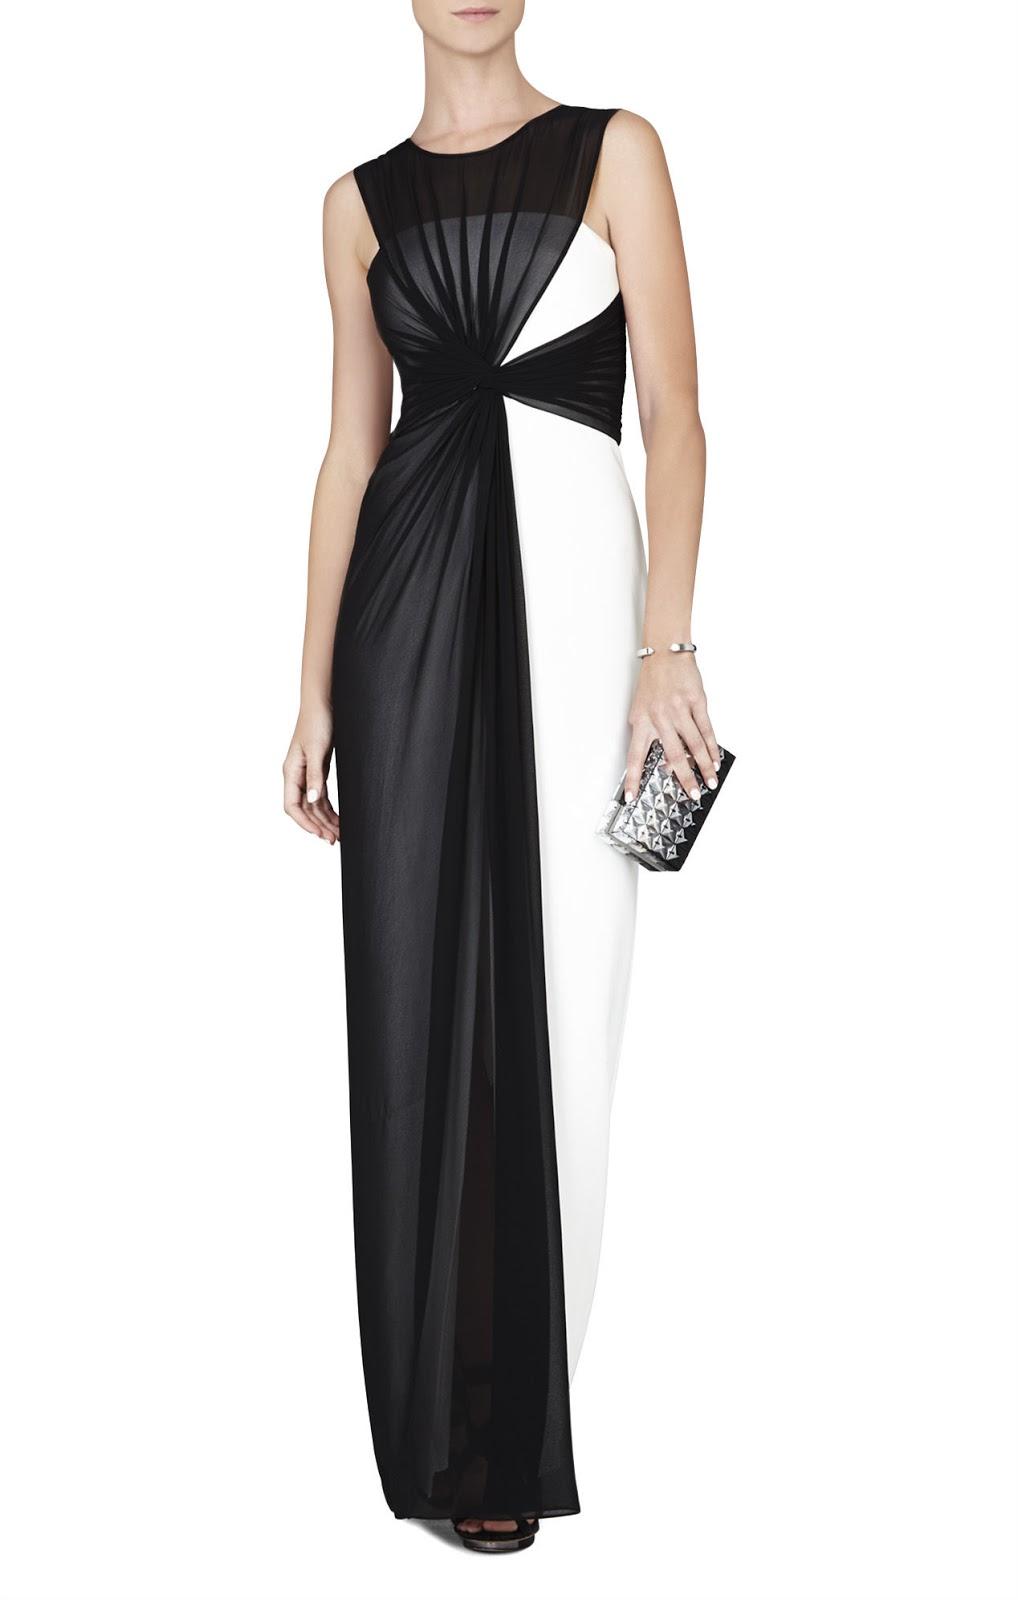 2016 Stylish Daily Black White Bcbg Evening Dresses